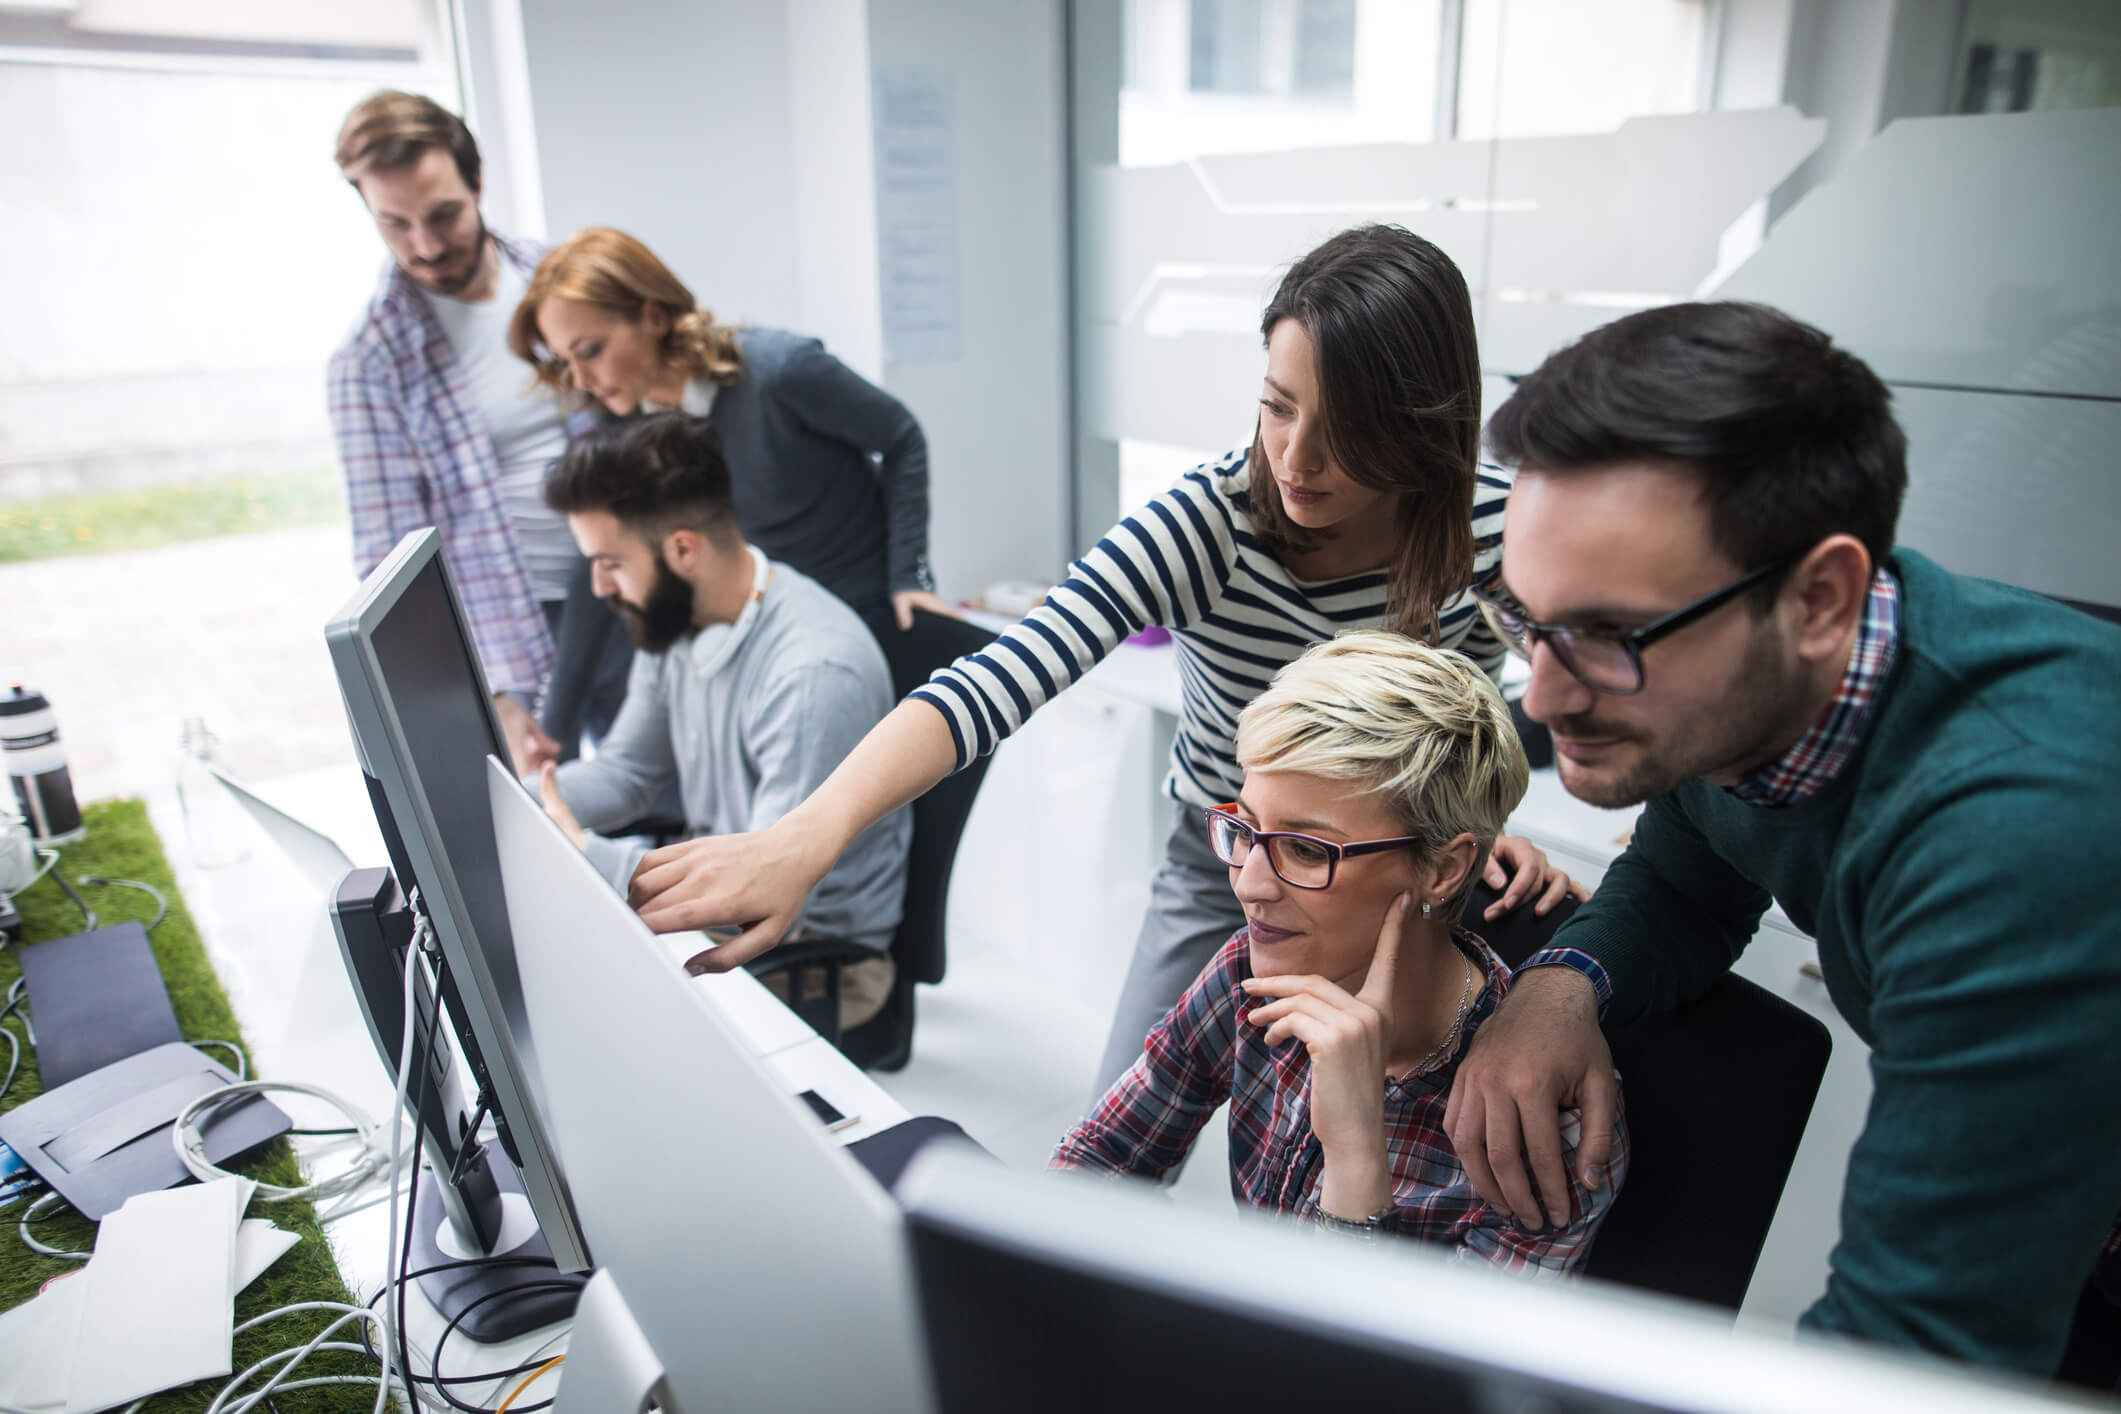 Aluguel de equipamentos de TI: como funciona e quais as vantagens?